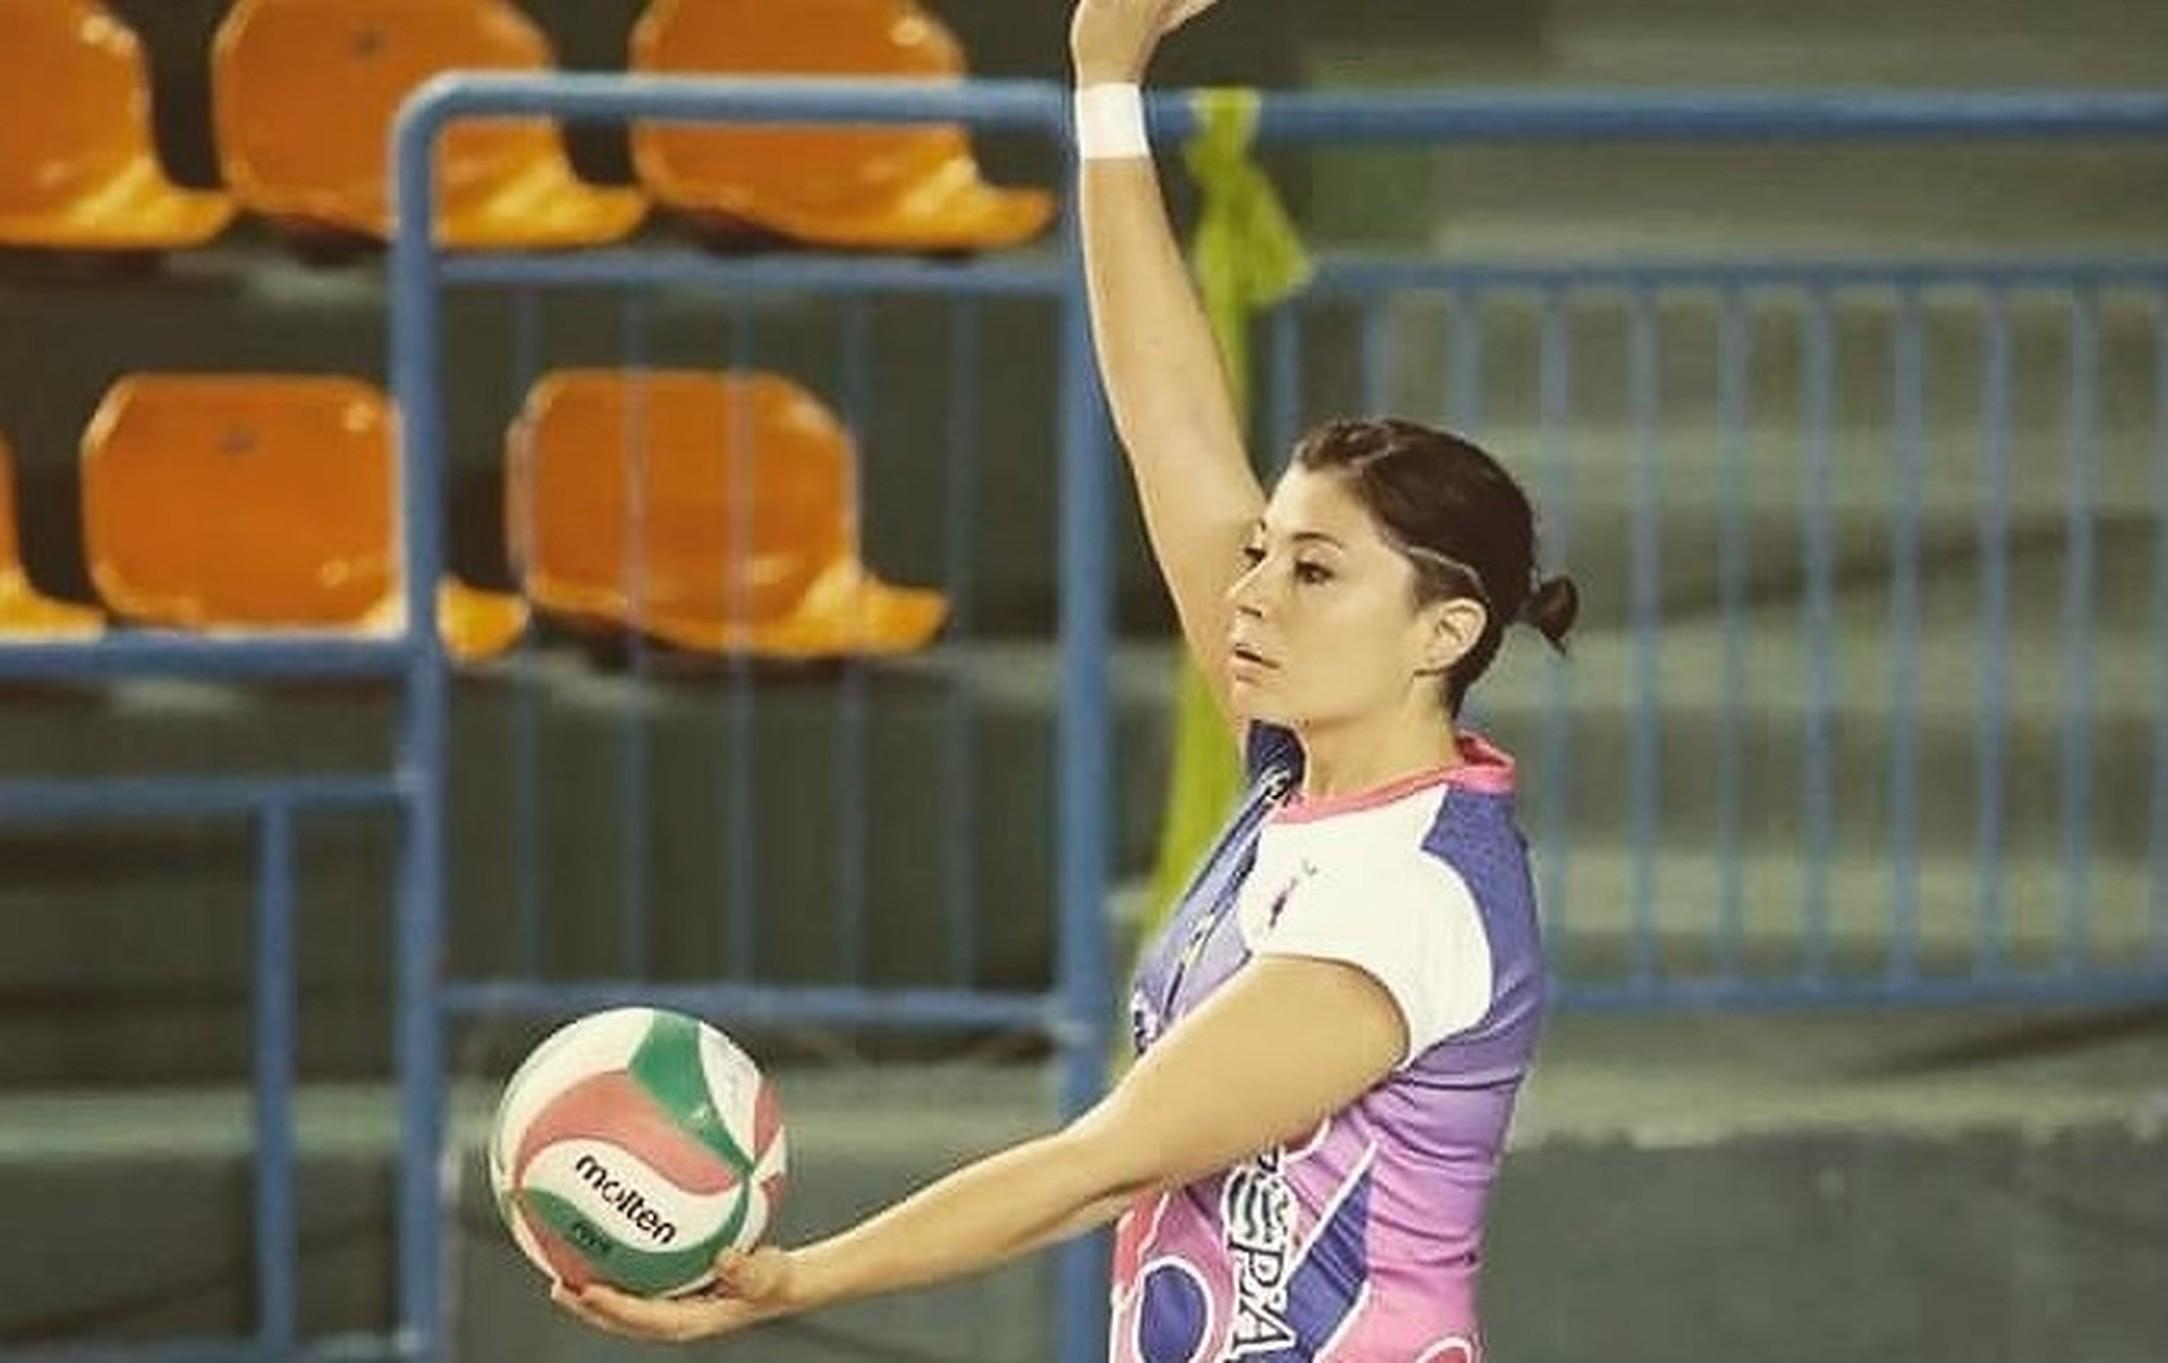 serie-c-regionale-volley-terracina-la-schiacciatrice-angela-manzo-e-biancoceleste